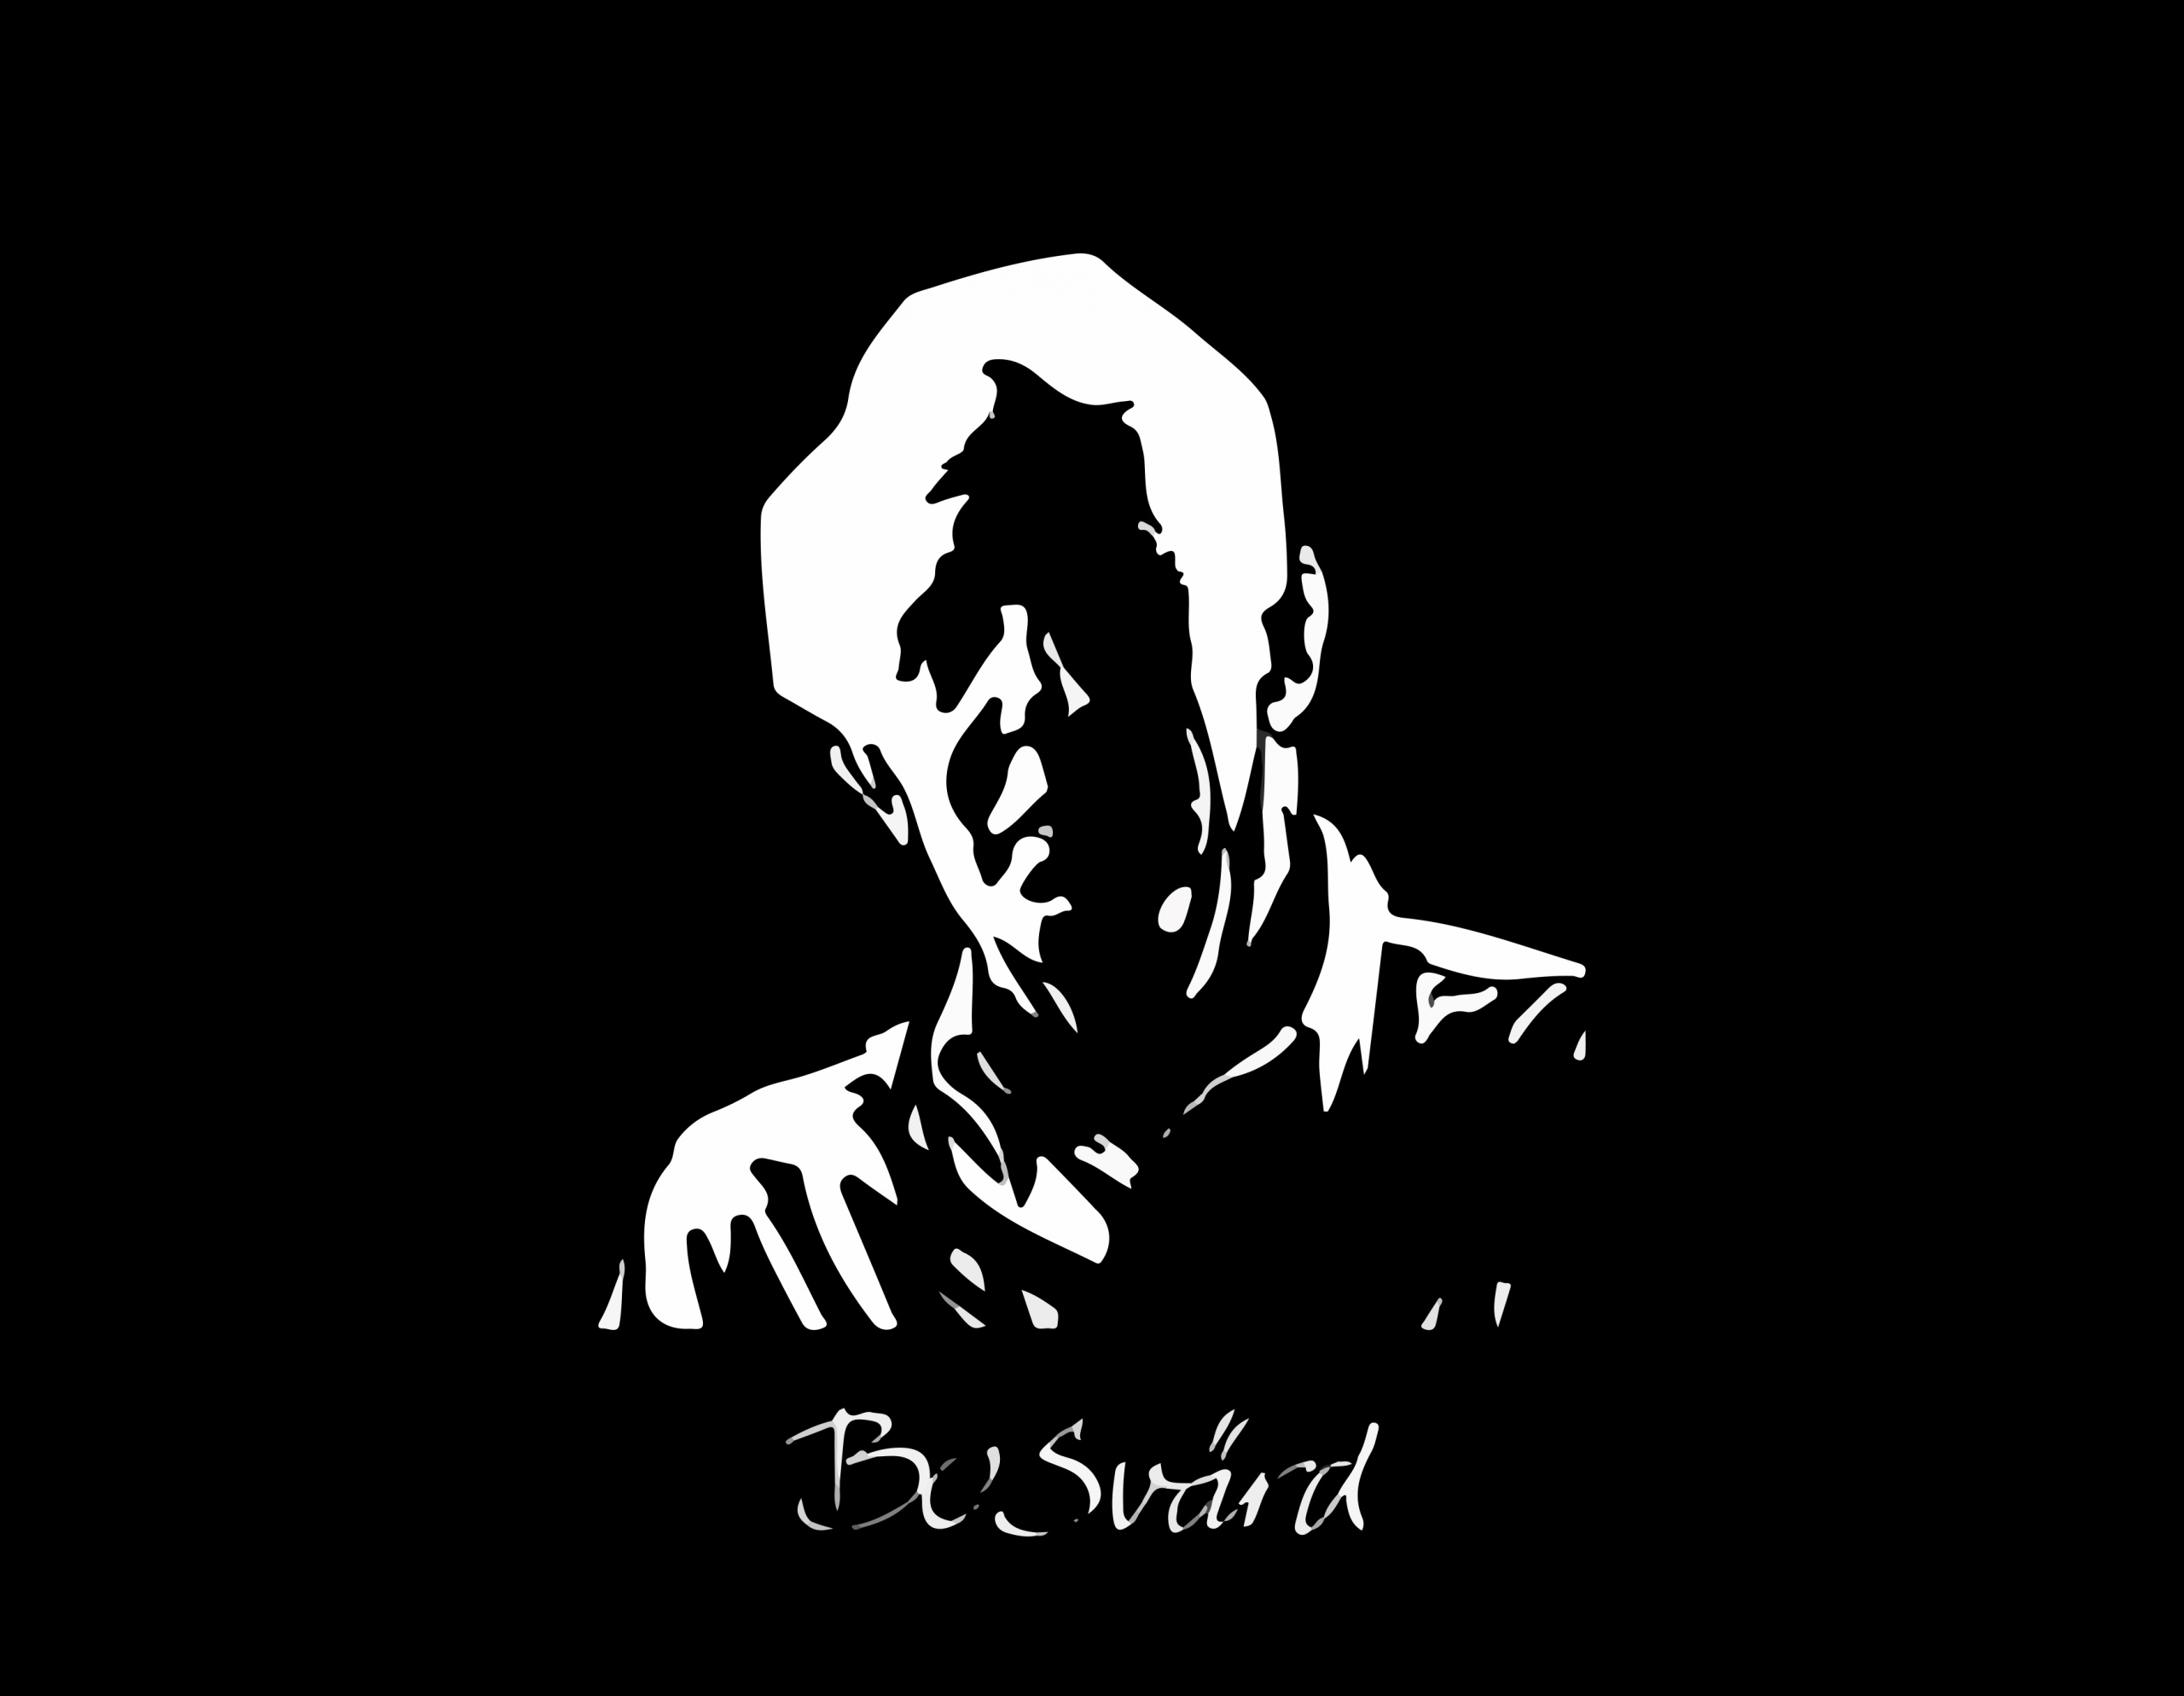 En svartvit skuggbild av en äldre man mot en svart bakgrund.